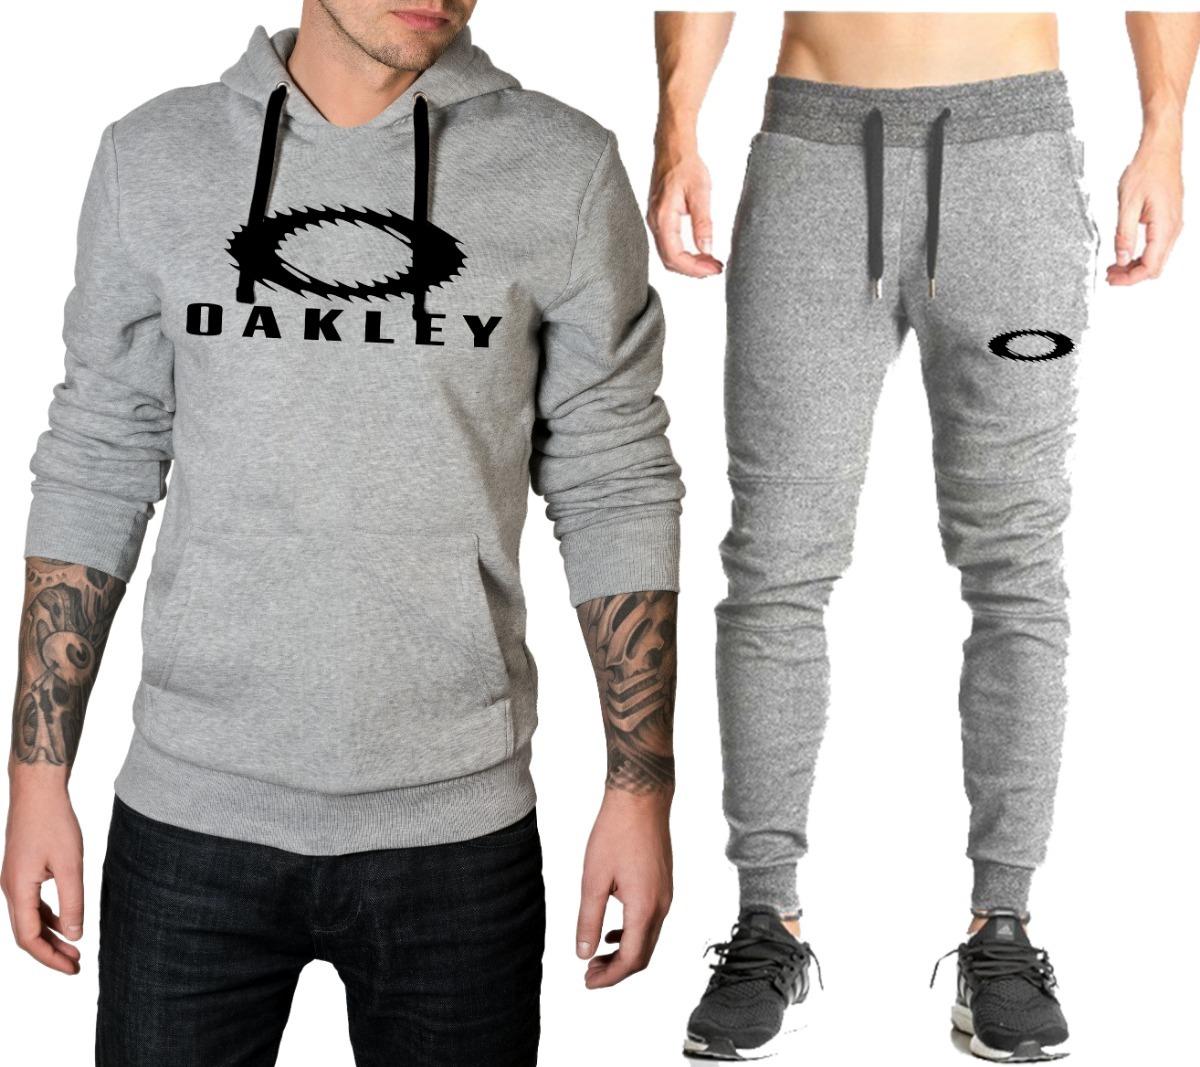 Blusa + Calça Oakley Mod 06 Conjunto Roupa Completo Promoção - R ... 70ee129c5a7